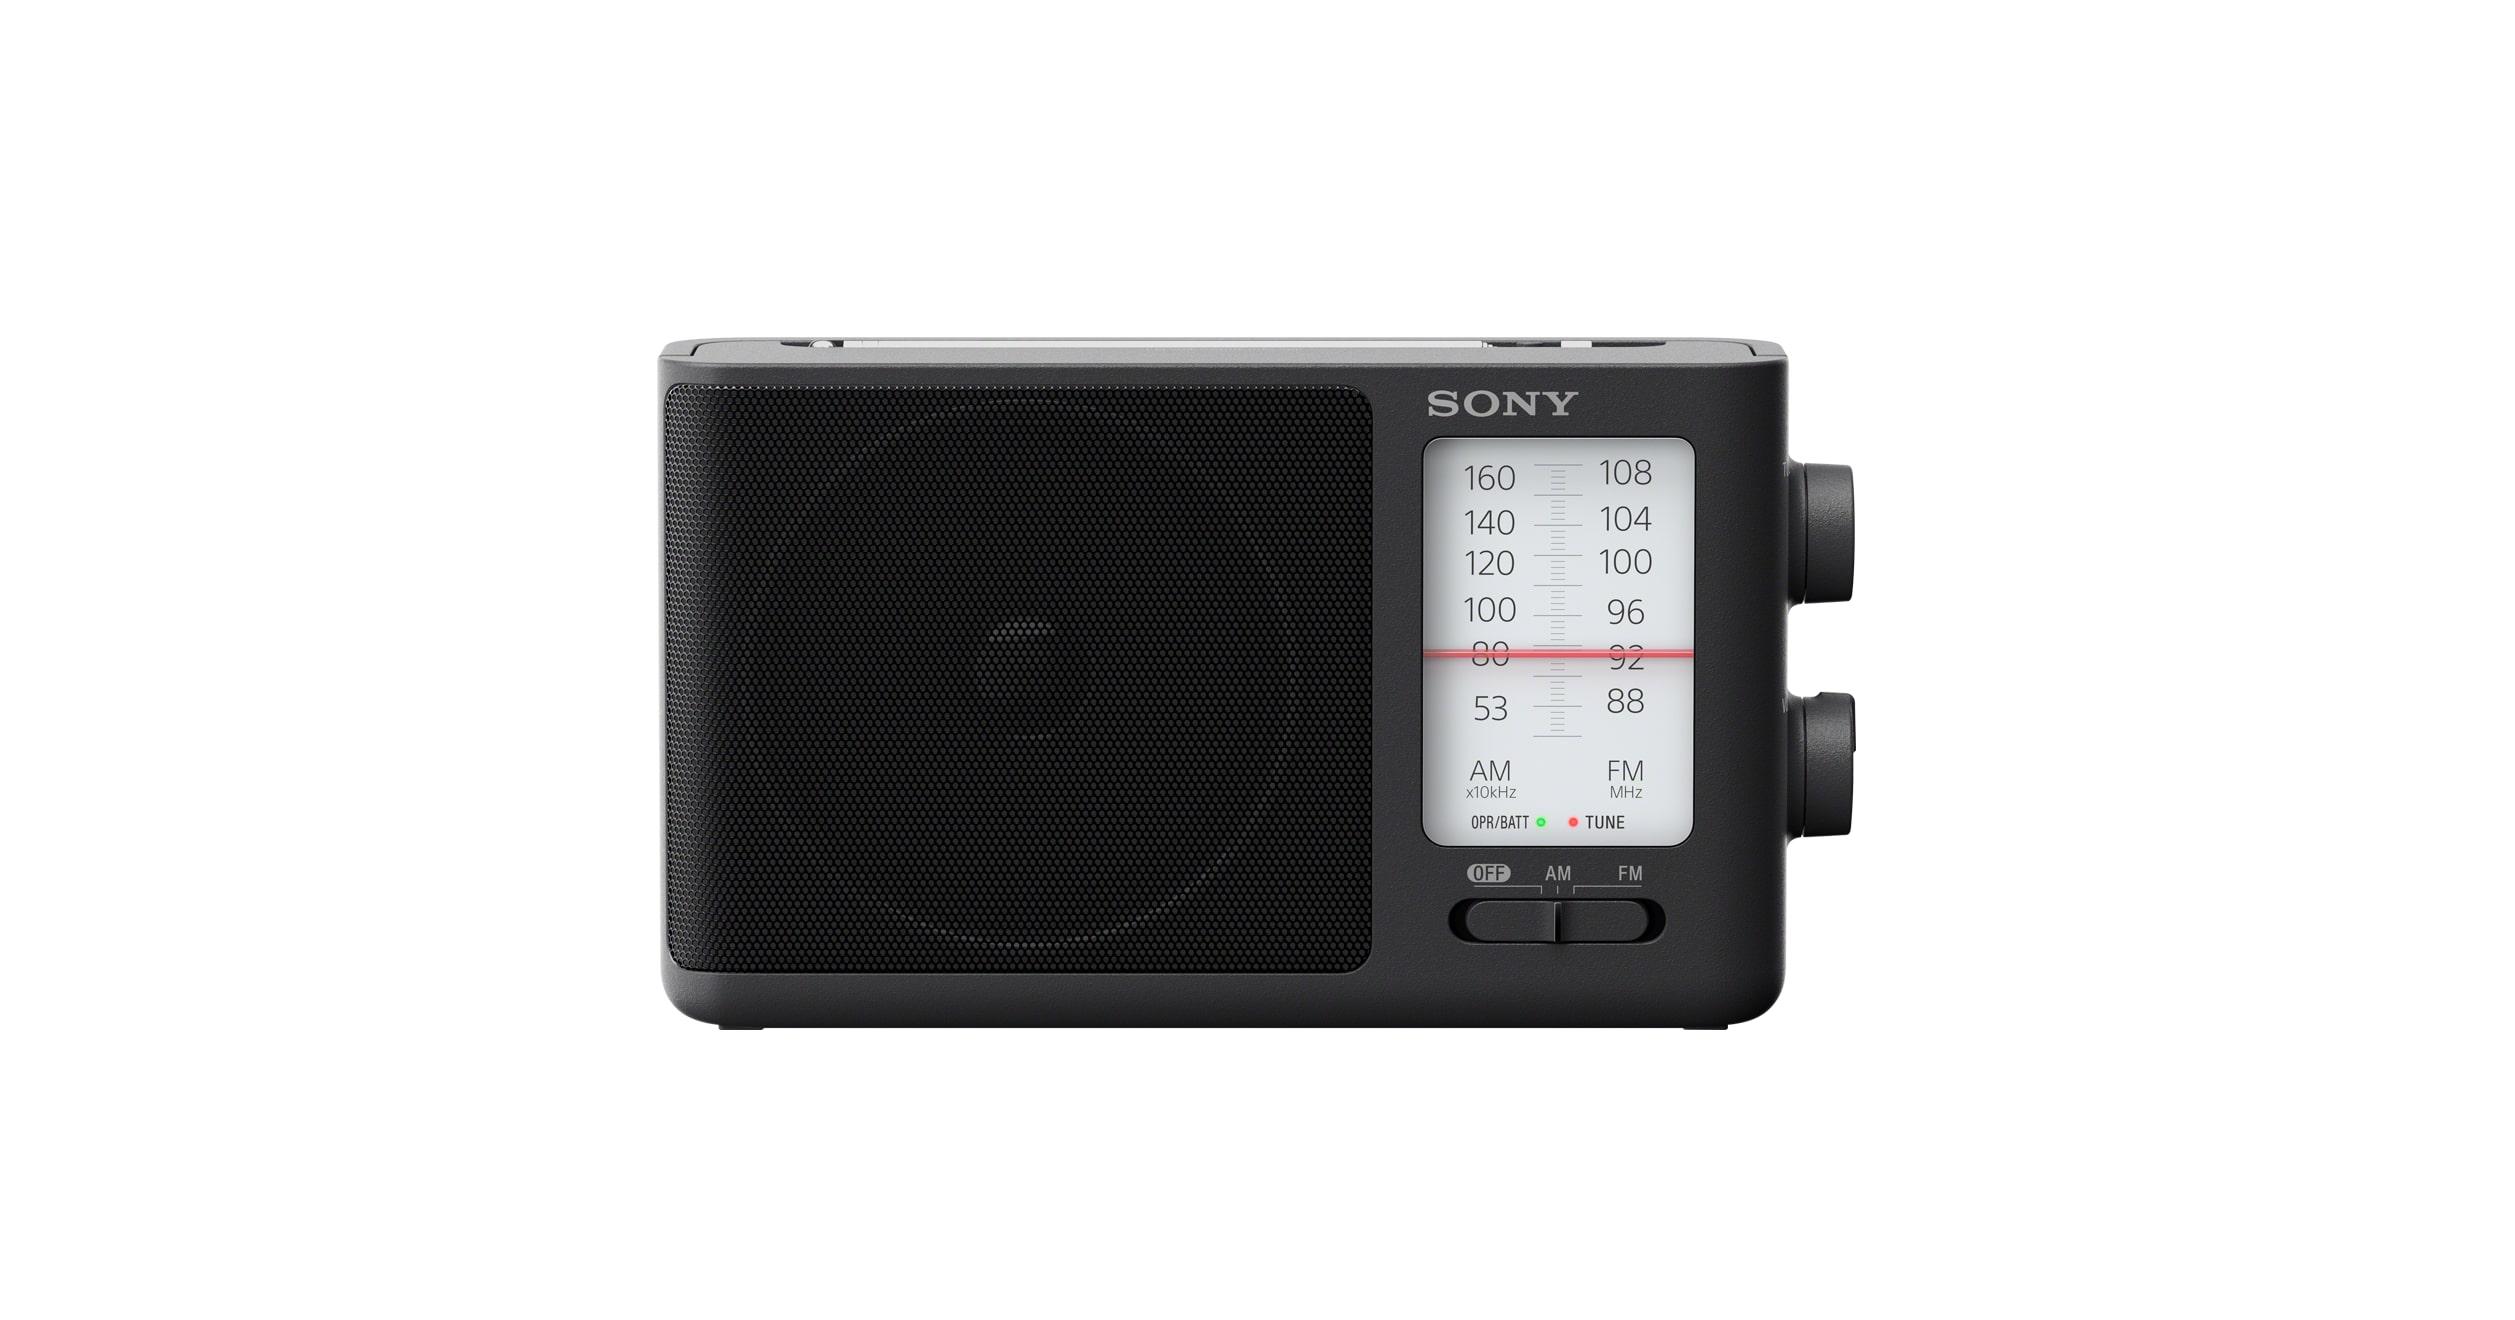 Analog Tuning Portable FM/AM Radio | ICF-506 | Sony Asia Pacific